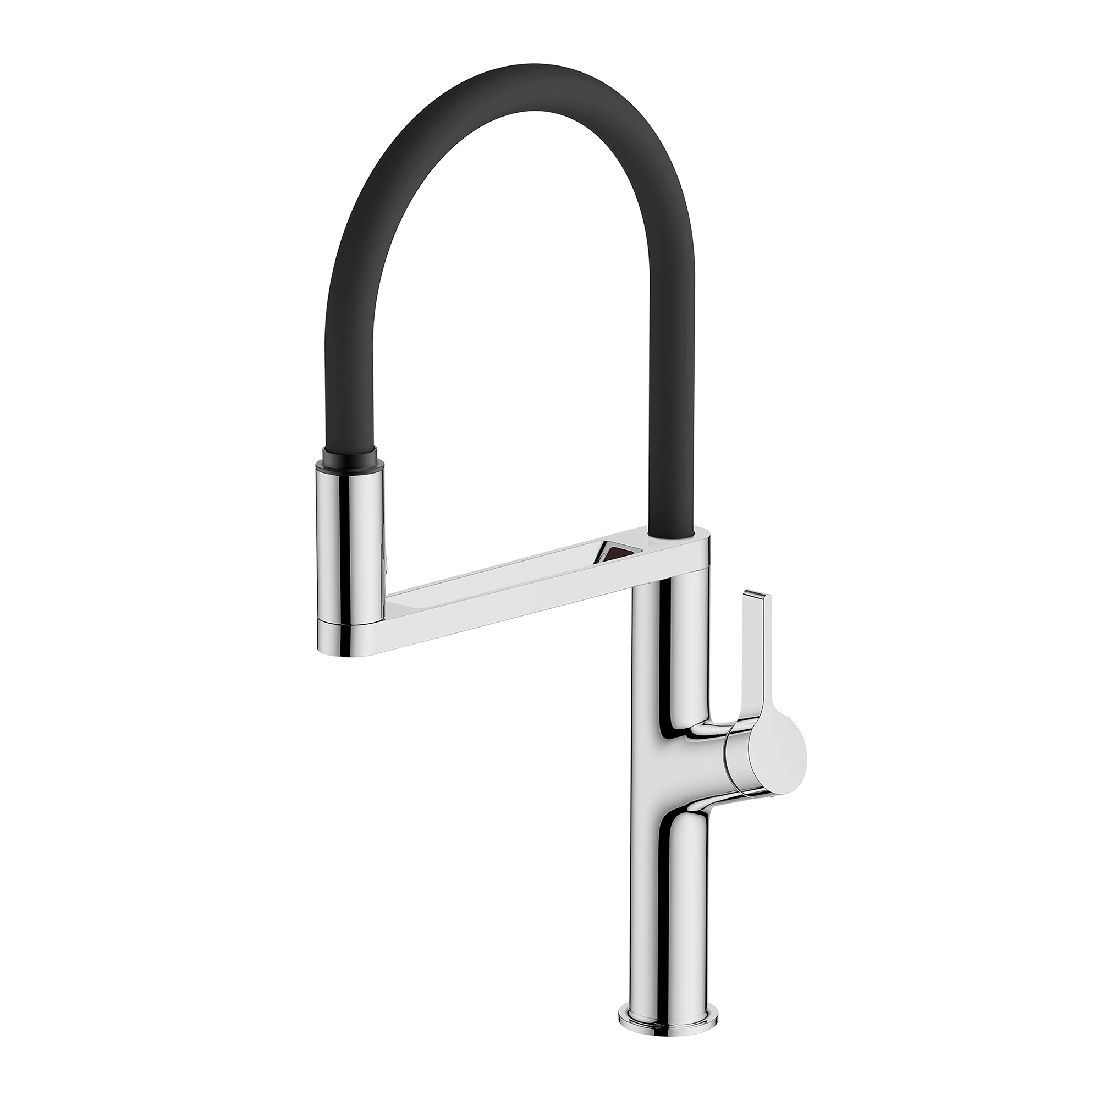 Galaxy Sensor Sink Mixer Chrome/Black